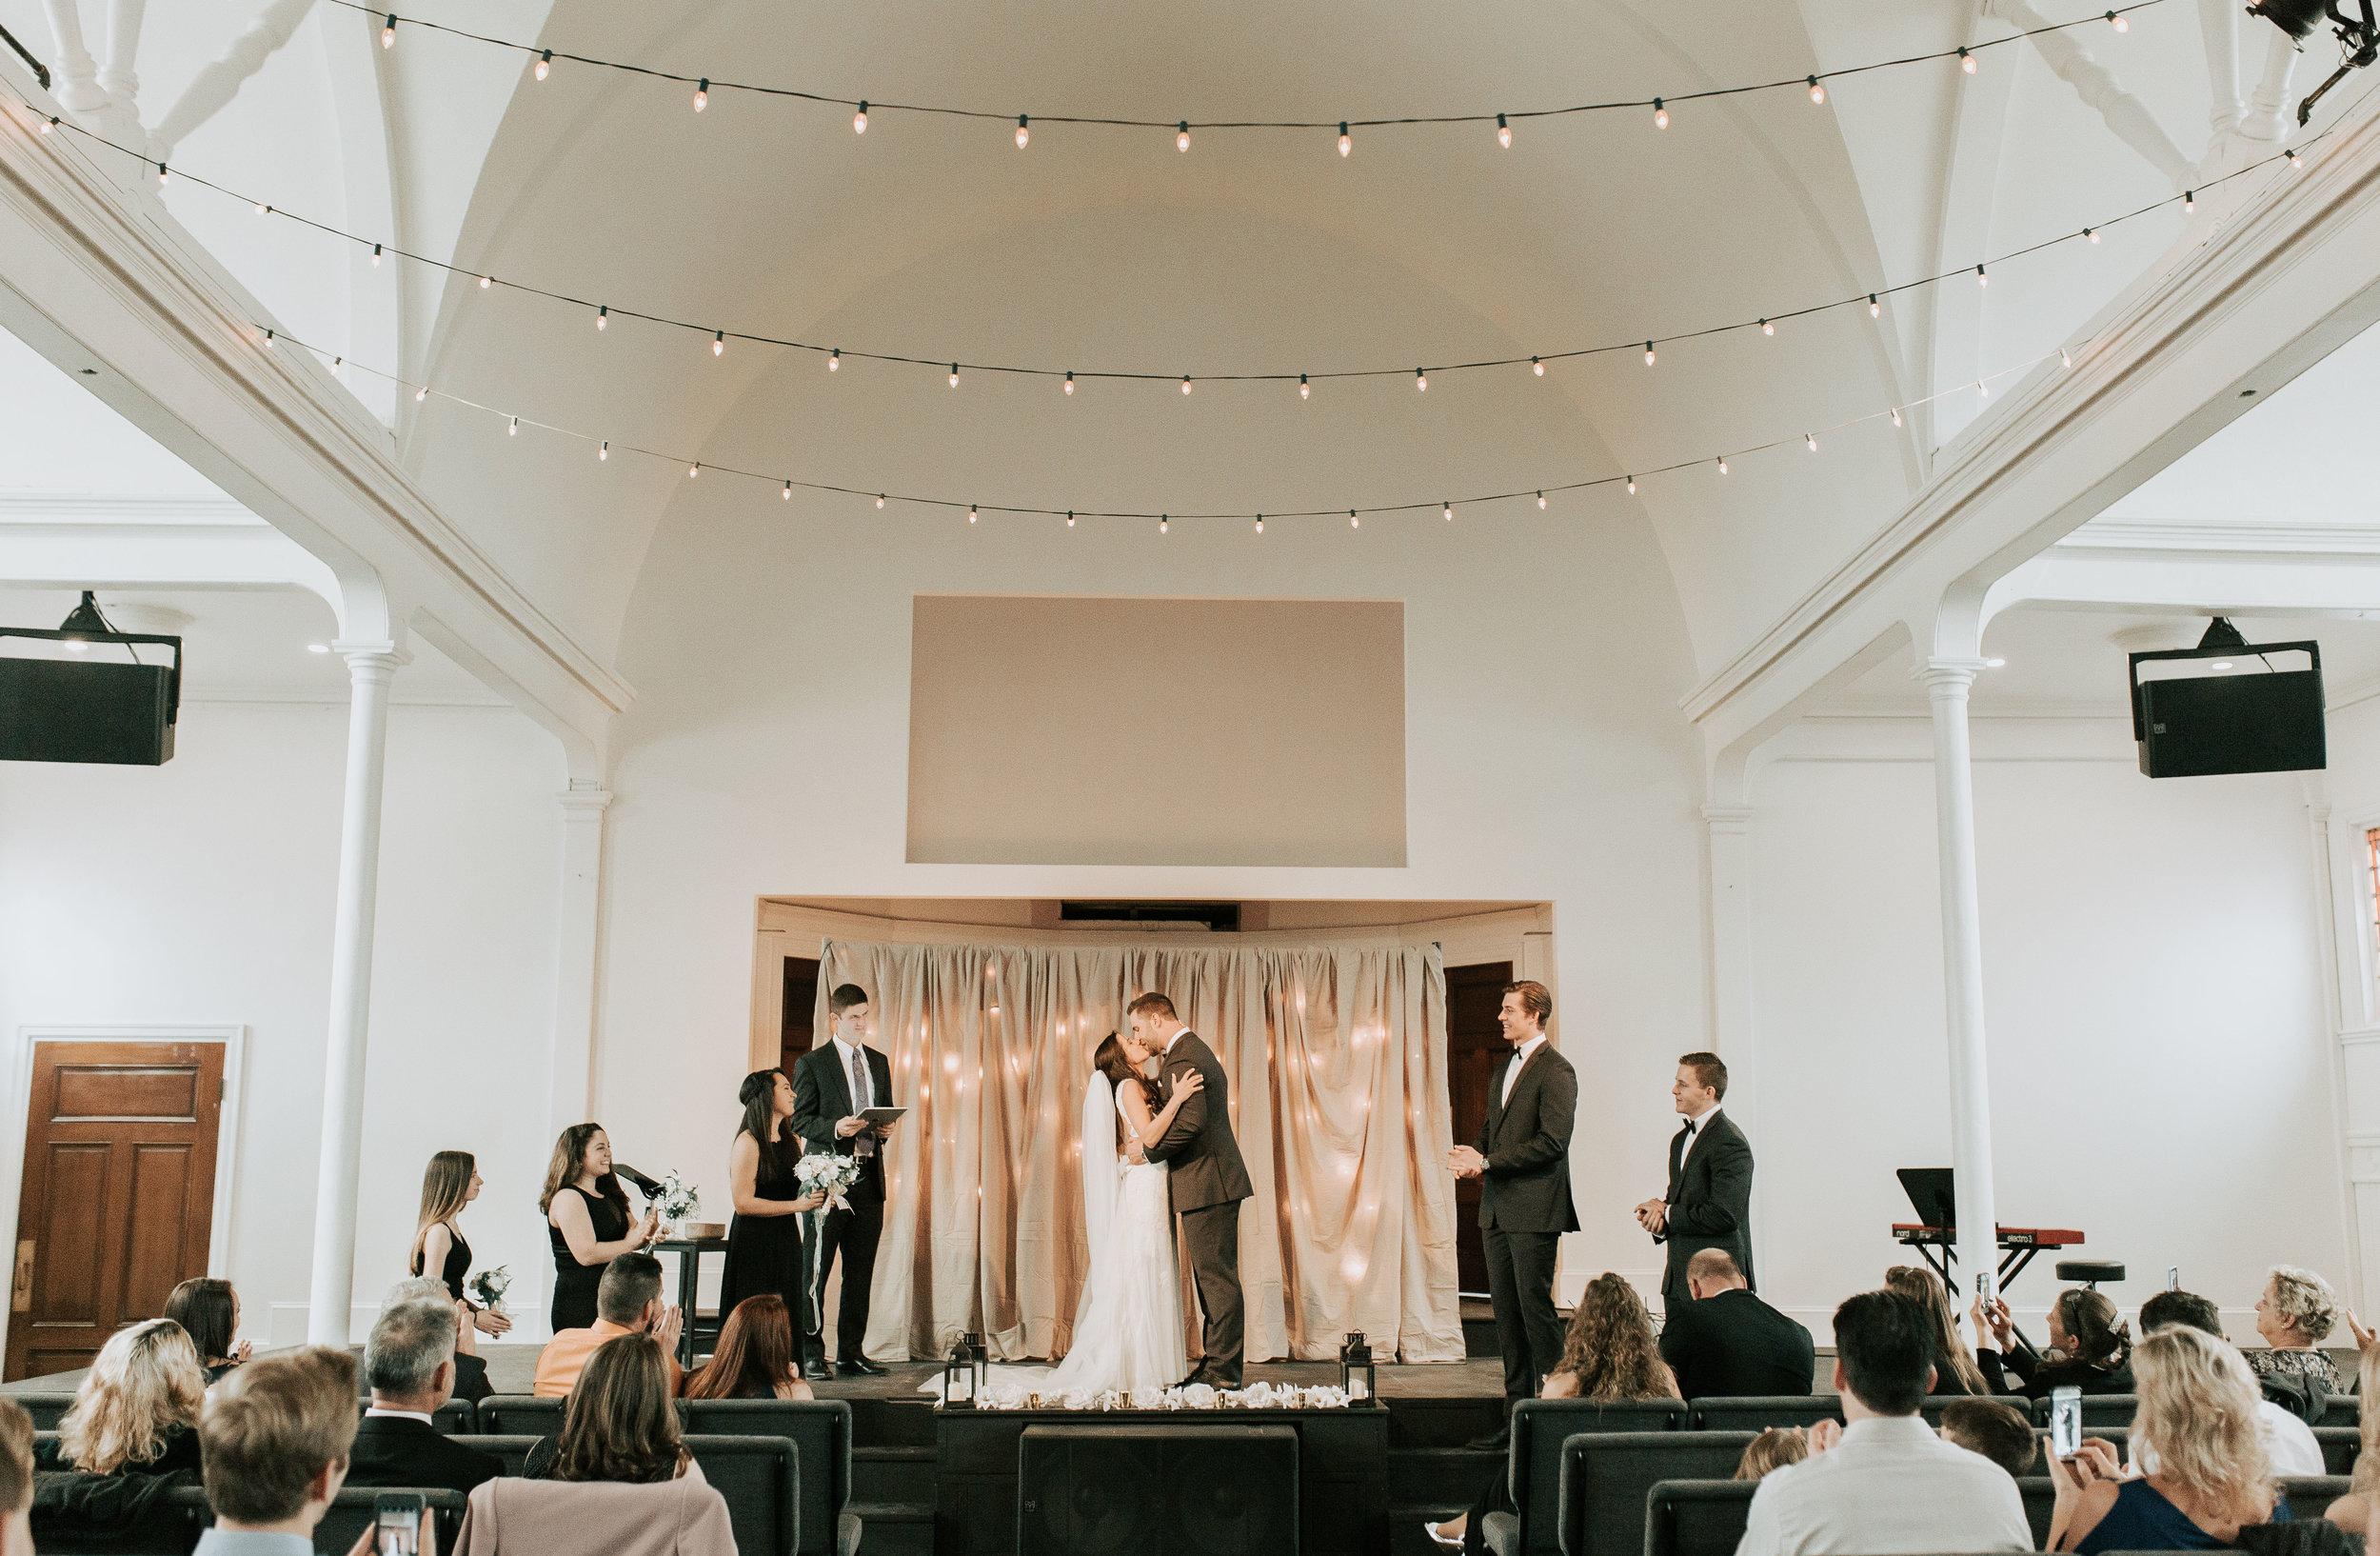 nicole-daacke-photography-boston-massachusetts-seaside-intimate-winter-wedding-photographer-13.jpg